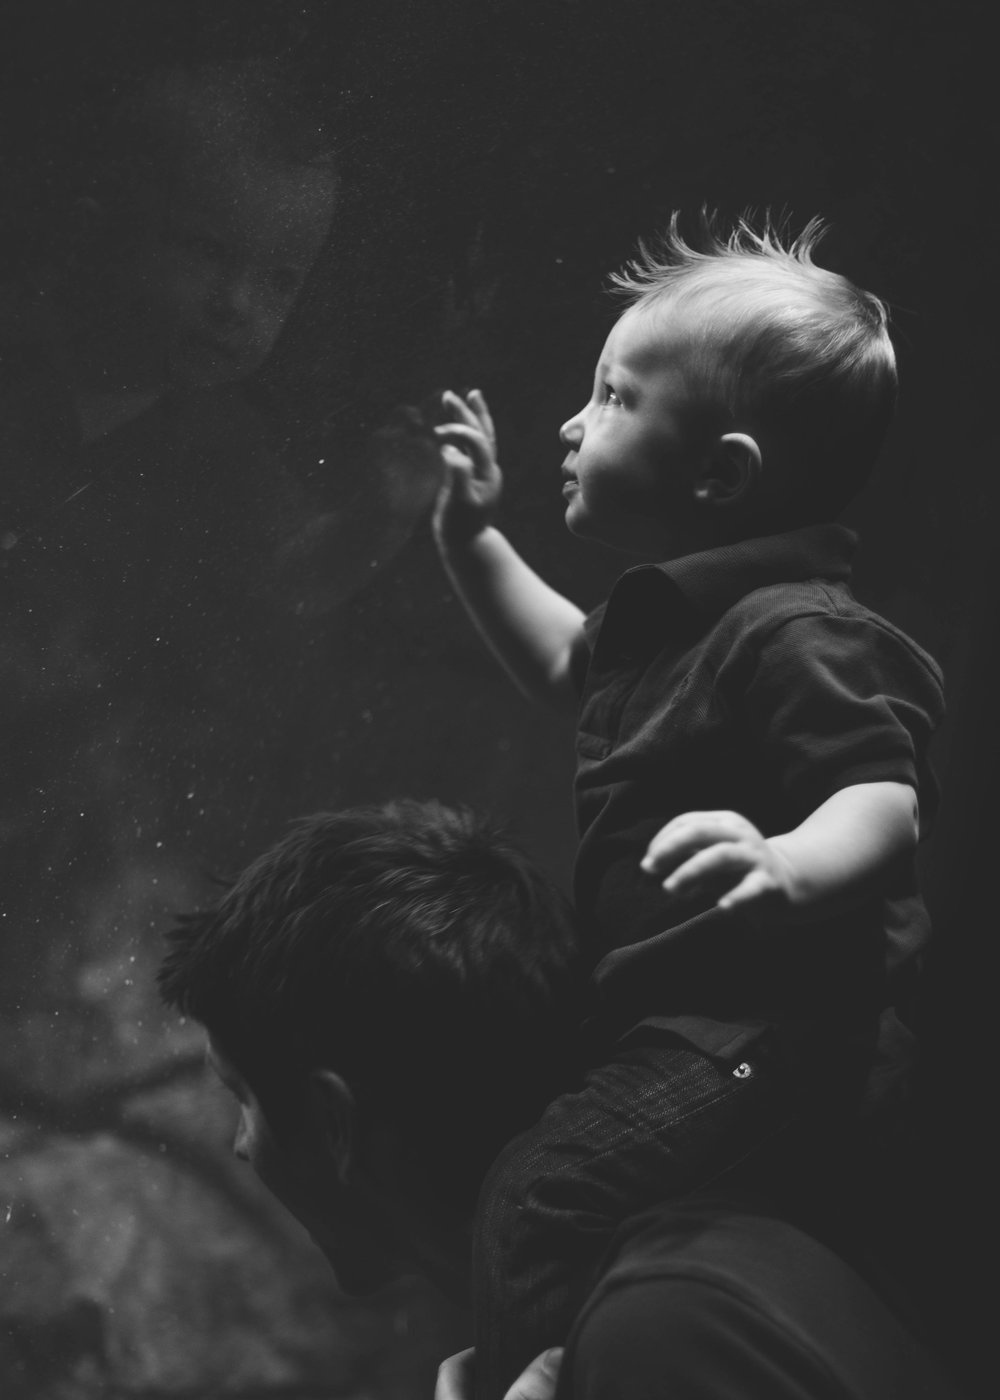 FamilyPhotography | Utah Photography | Utah Newborns| Family Lifestyle| Utah Photography| Child Pictures| Baby | Dellany Elizabeth | One Year Birthday |Photography | Birthday Ideas